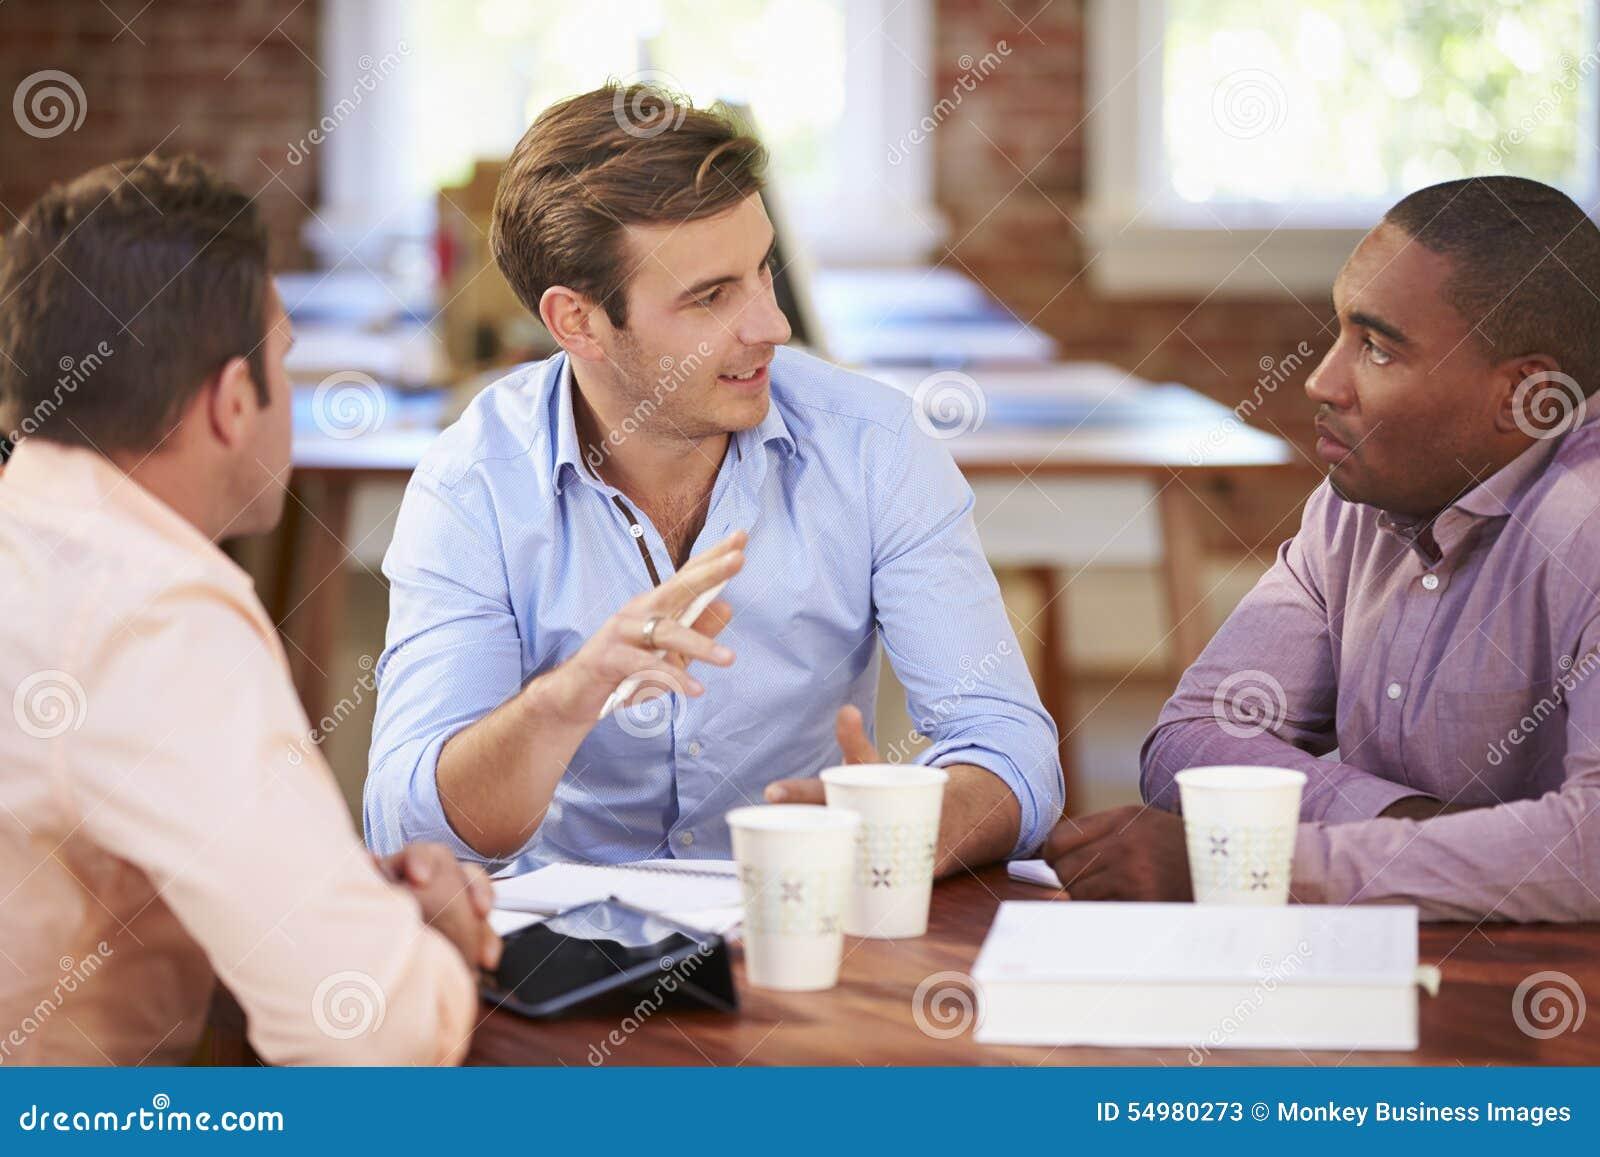 Groep Zakenliedenvergadering om Ideeën te bespreken